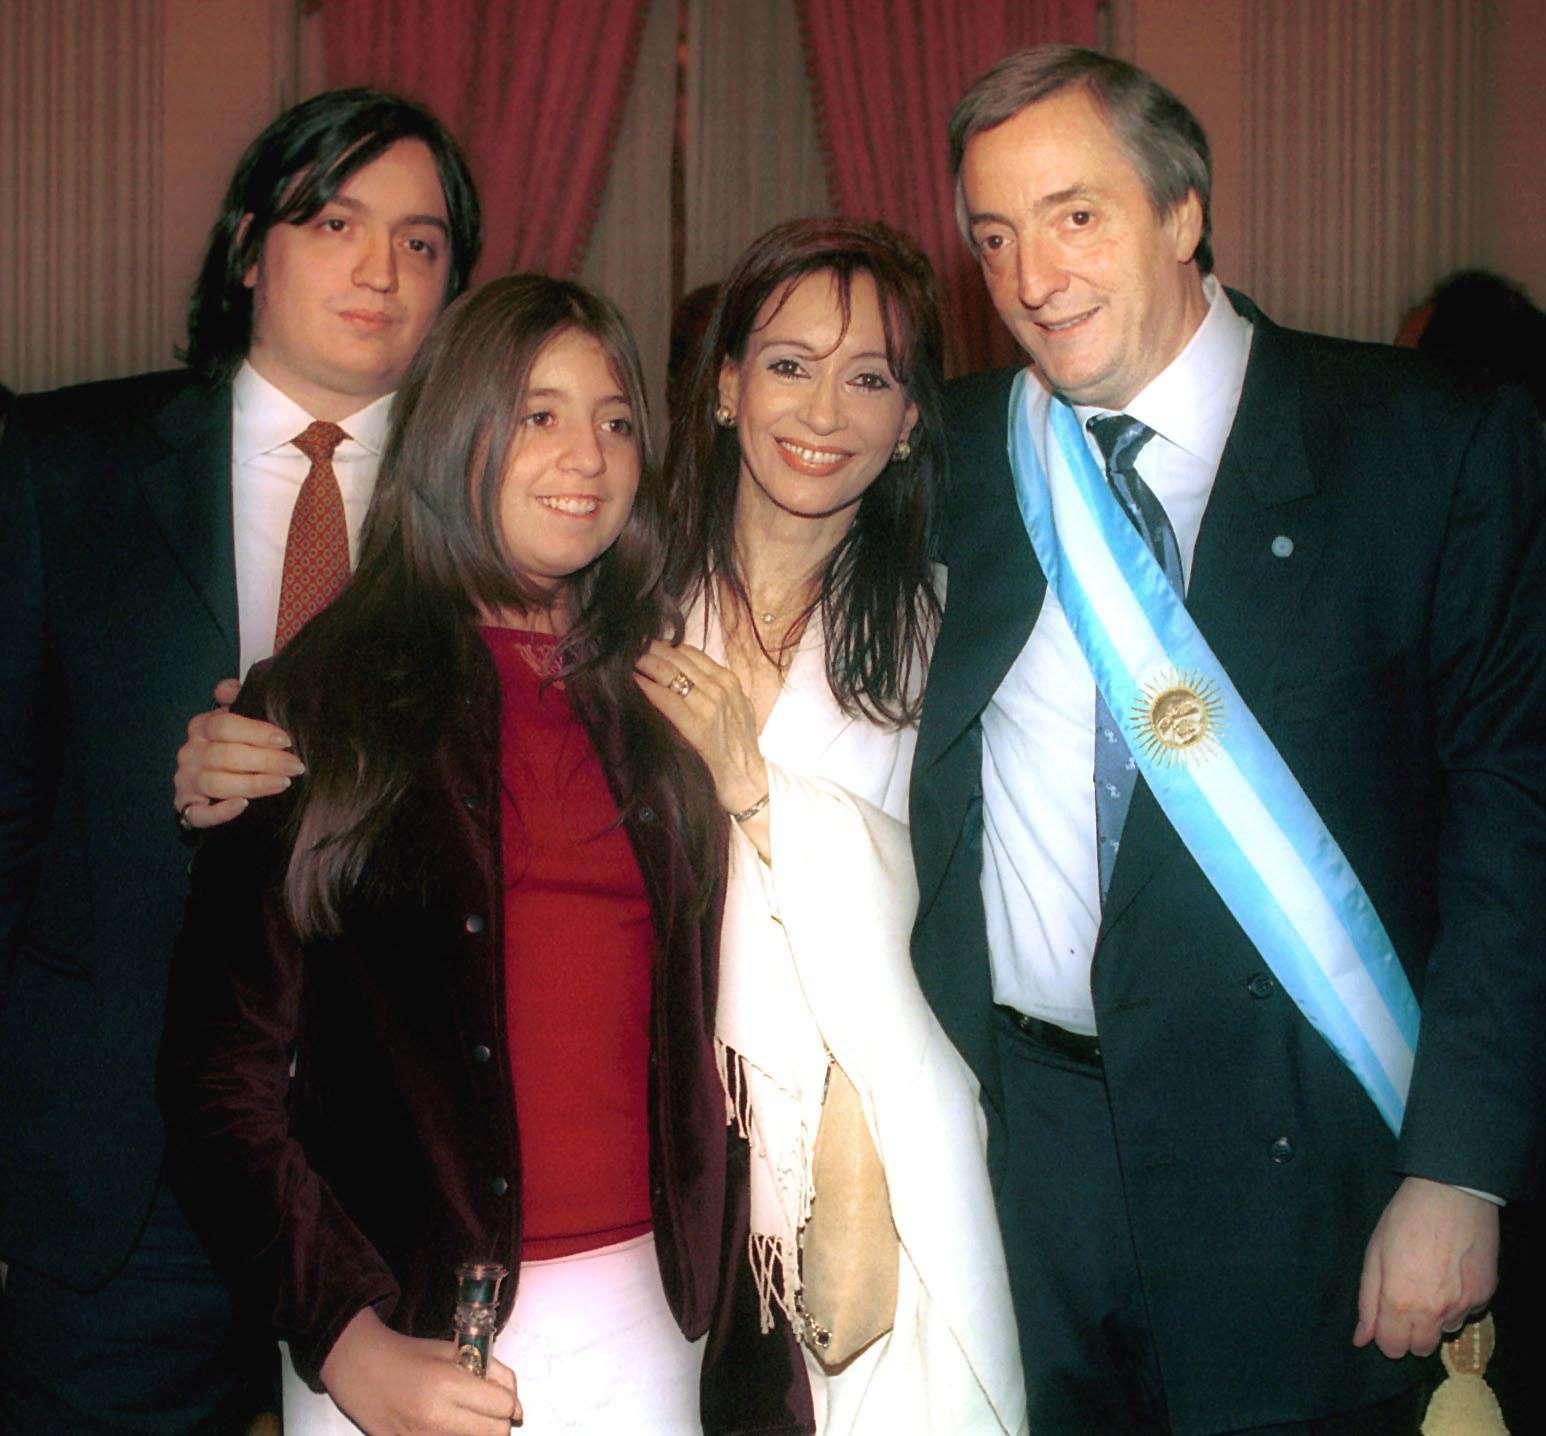 La familia Kirchner, bajo la lupa del juez Bonadío. Foto: NA